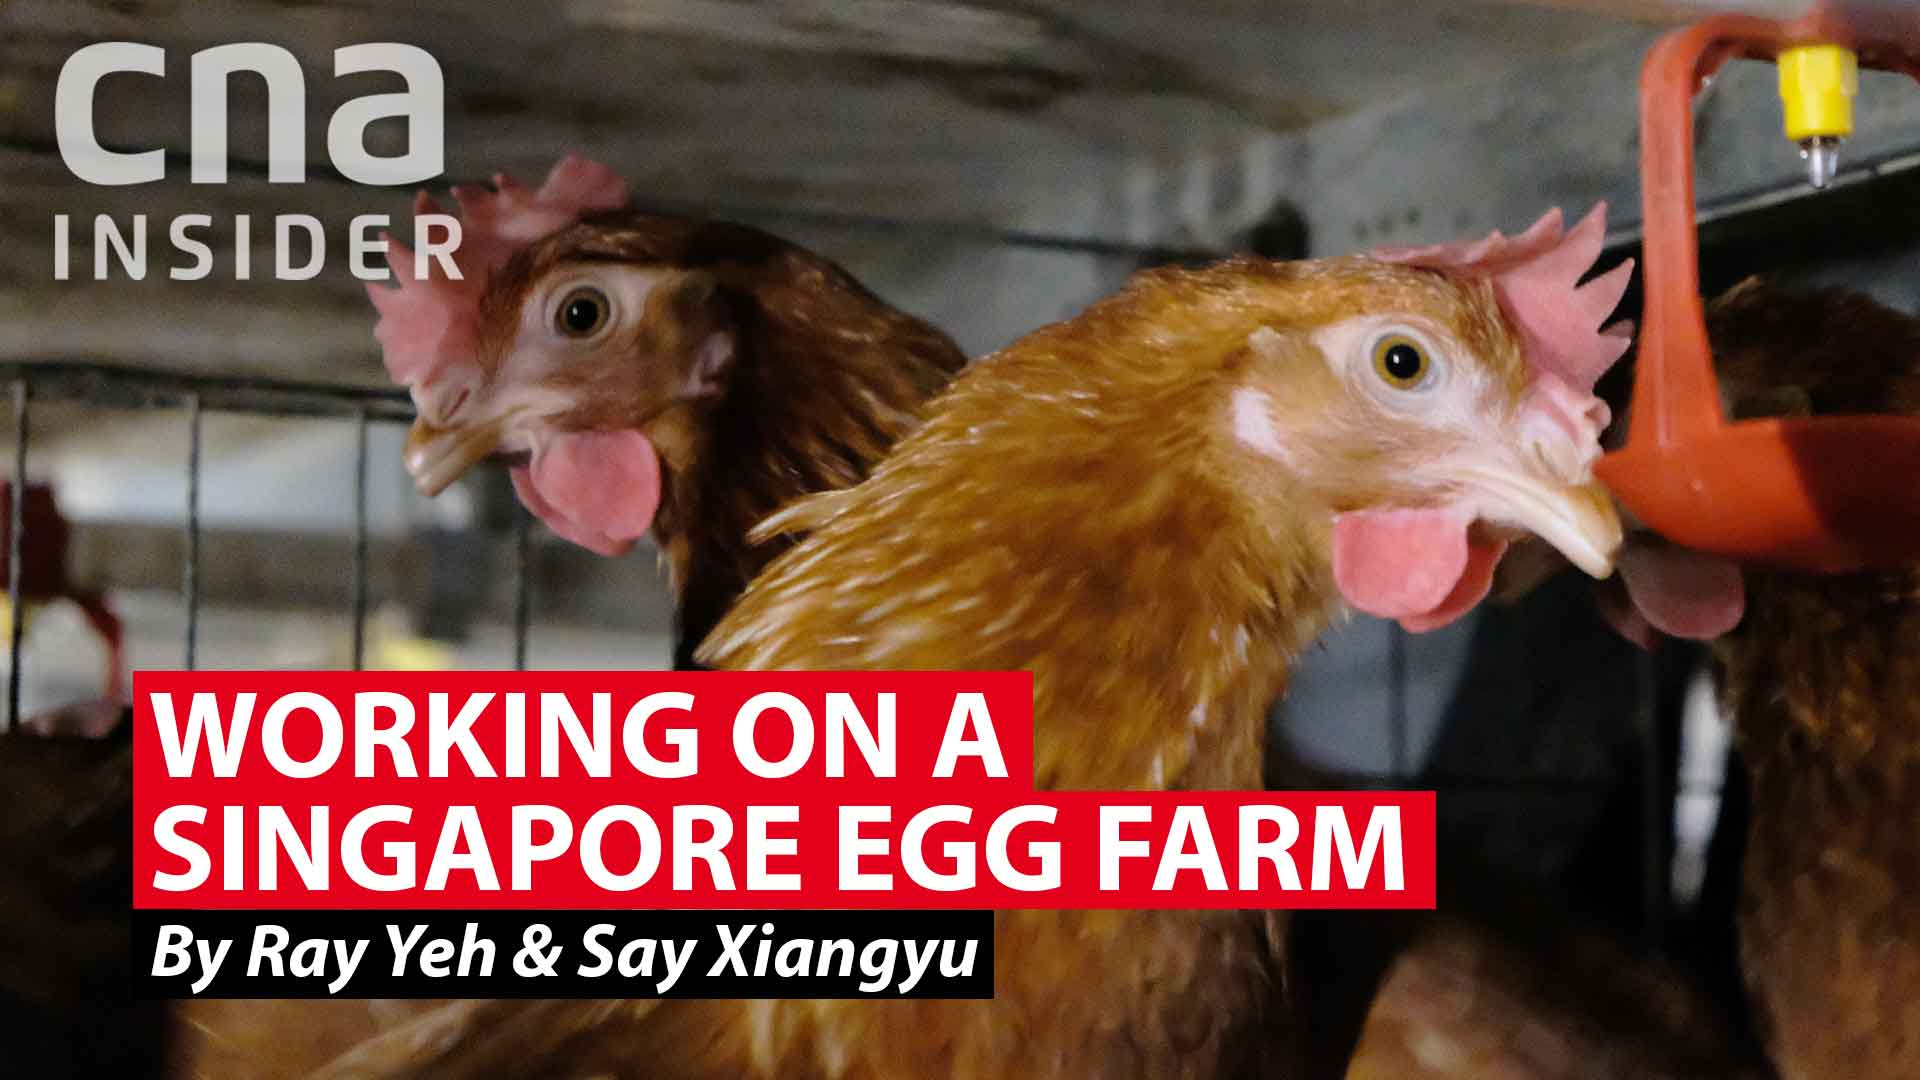 Working on a Singapore egg farm